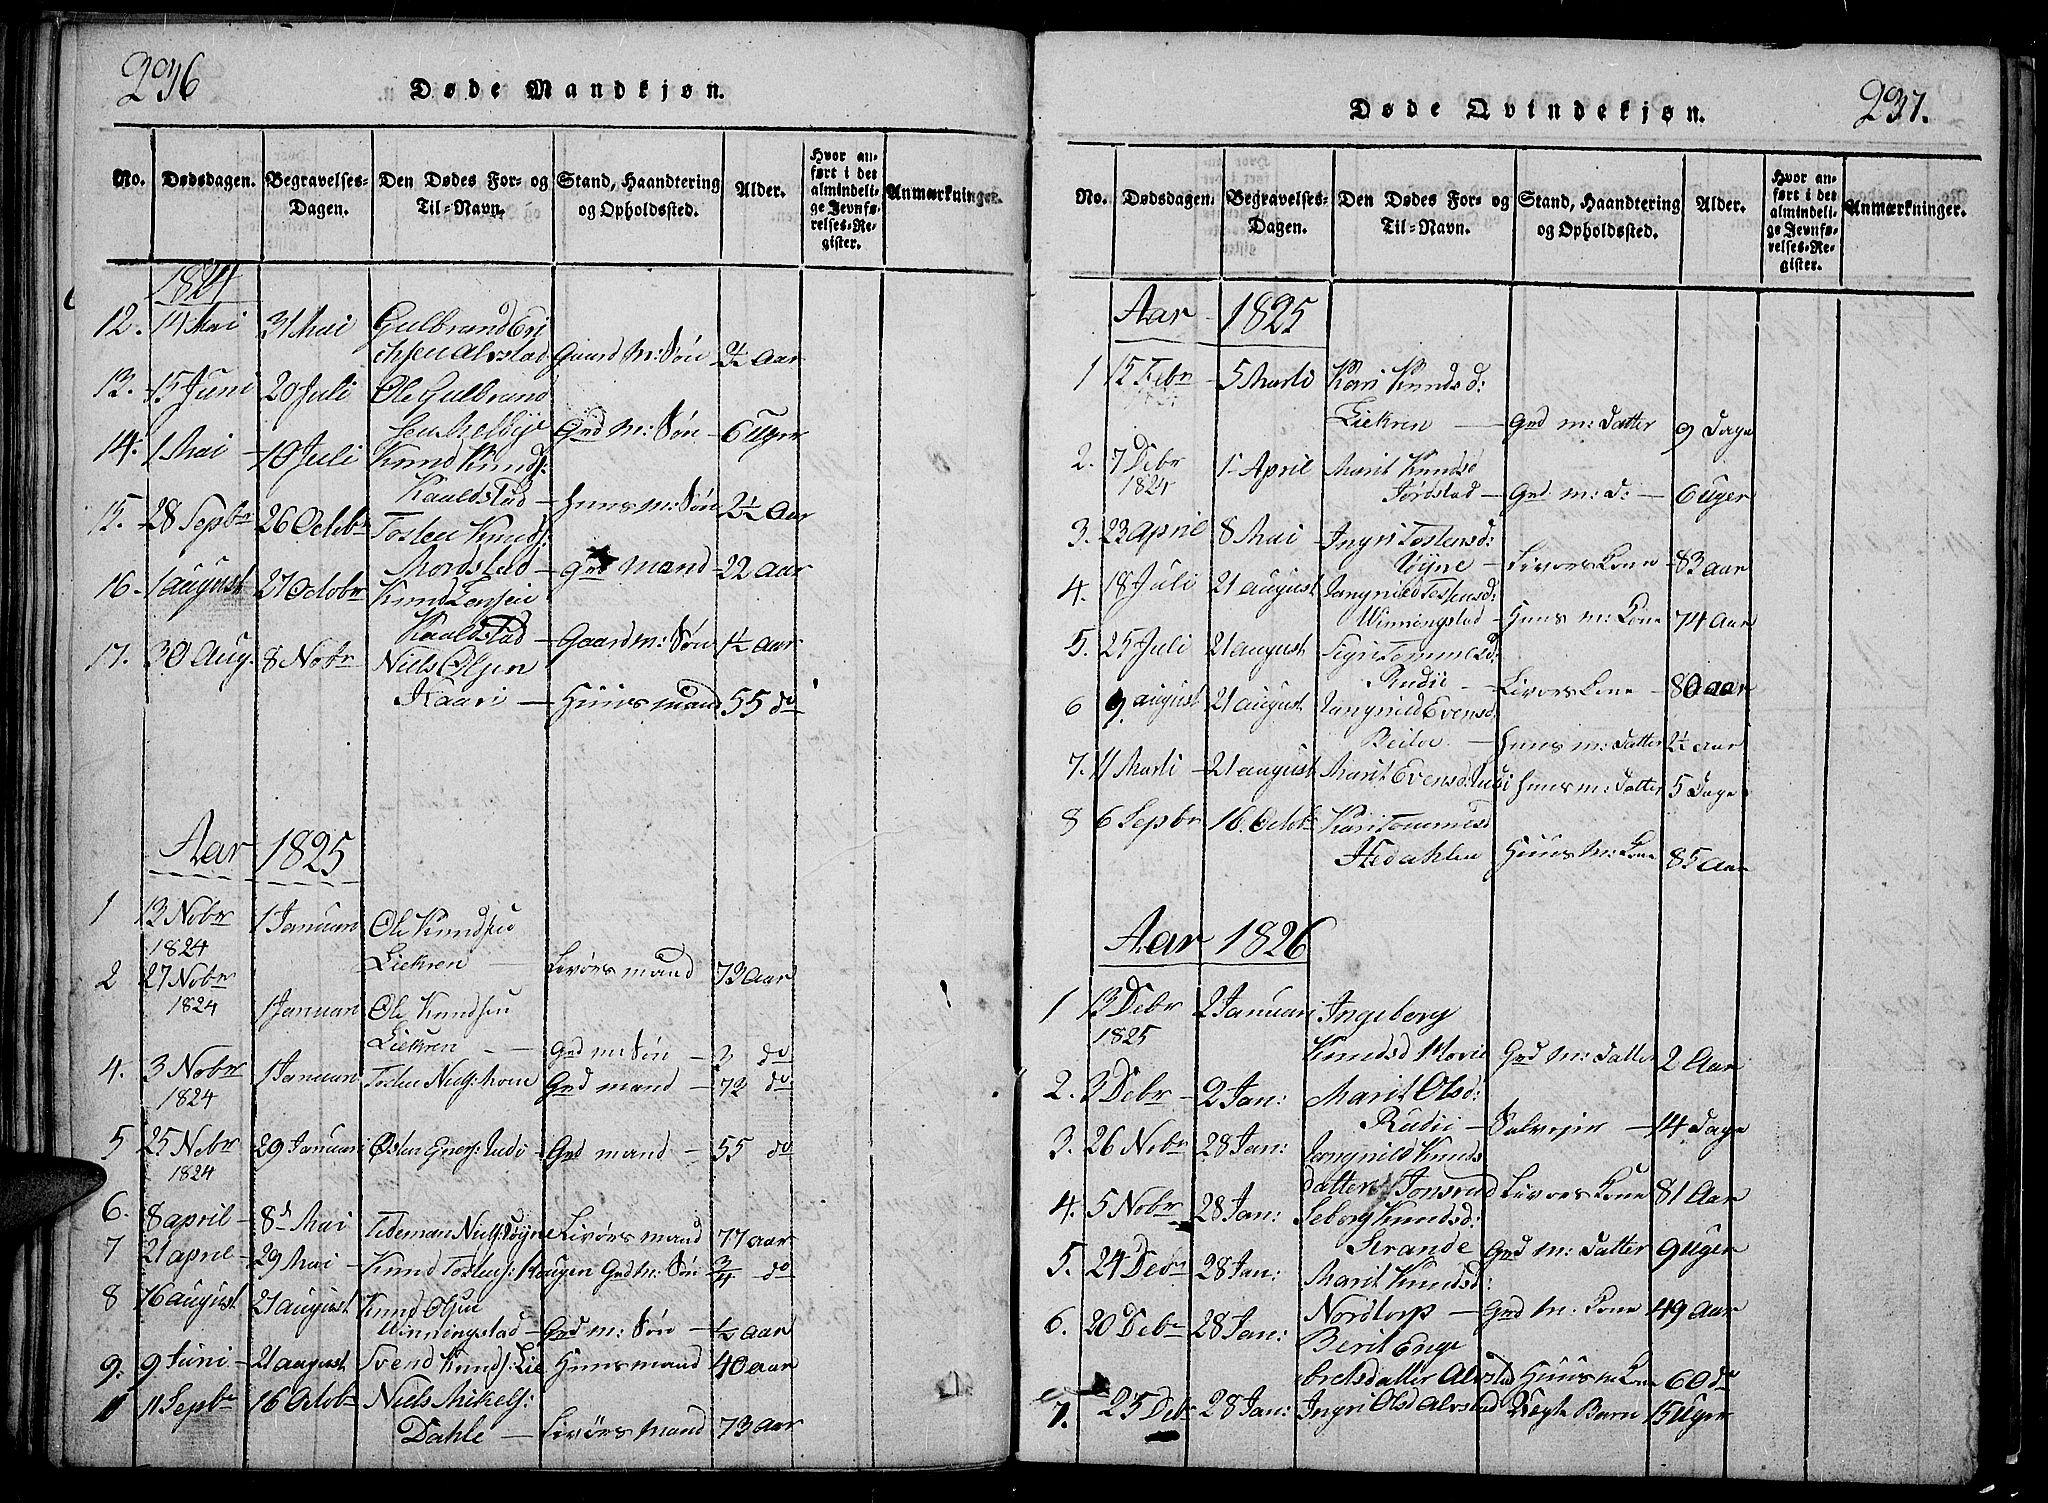 SAH, Slidre prestekontor, Klokkerbok nr. 2, 1814-1839, s. 236-237